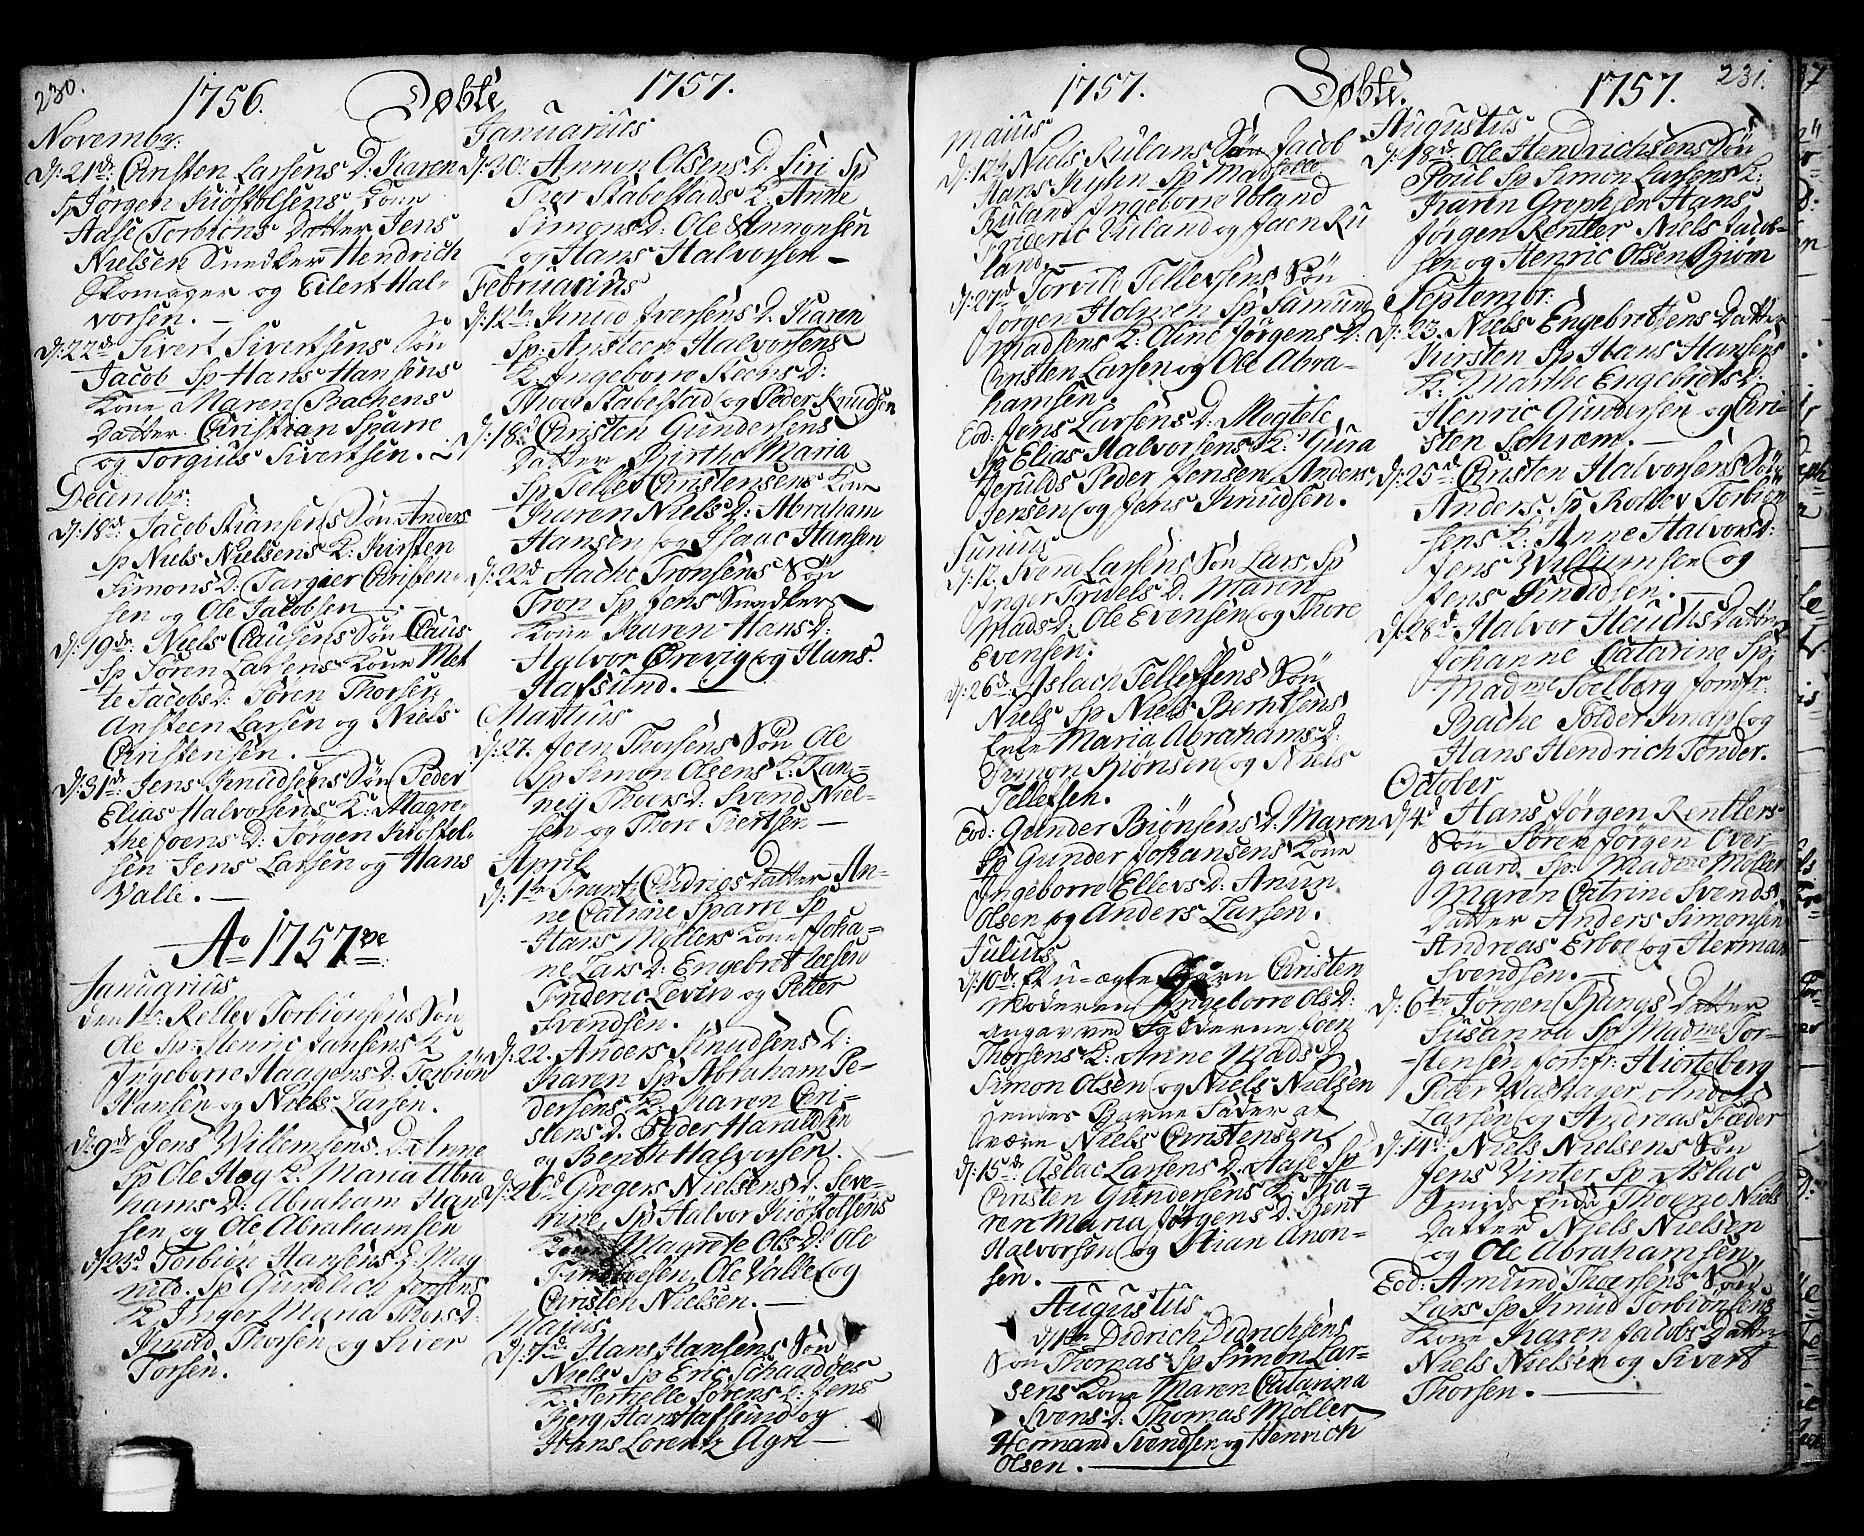 SAKO, Kragerø kirkebøker, F/Fa/L0001: Ministerialbok nr. 1, 1702-1766, s. 230-231